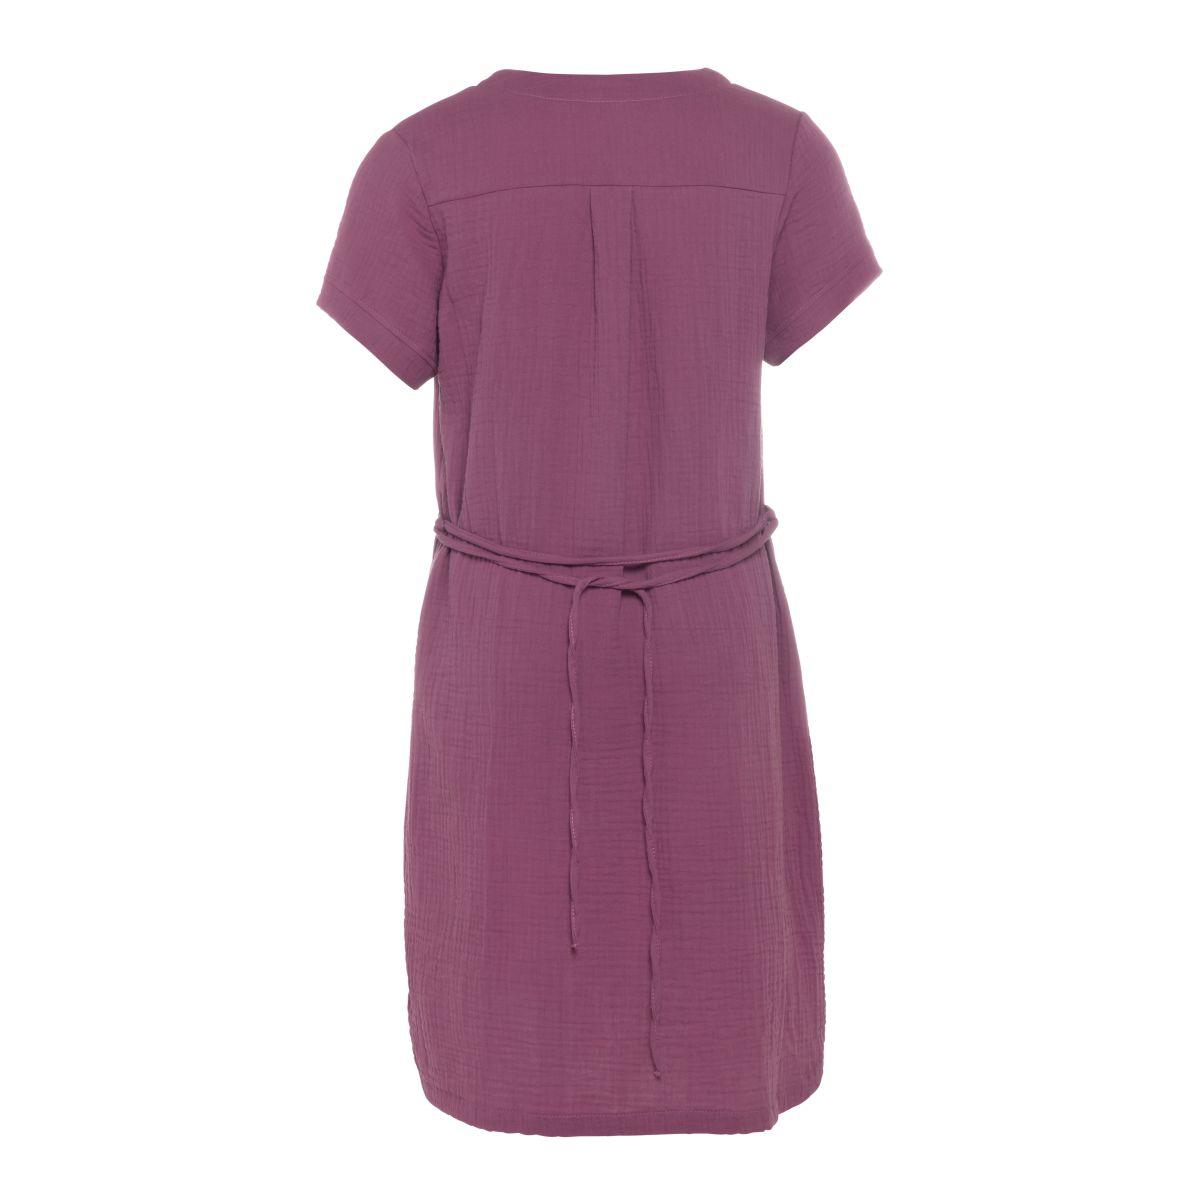 knit factory kf15012004350 indy jurk purple m 2